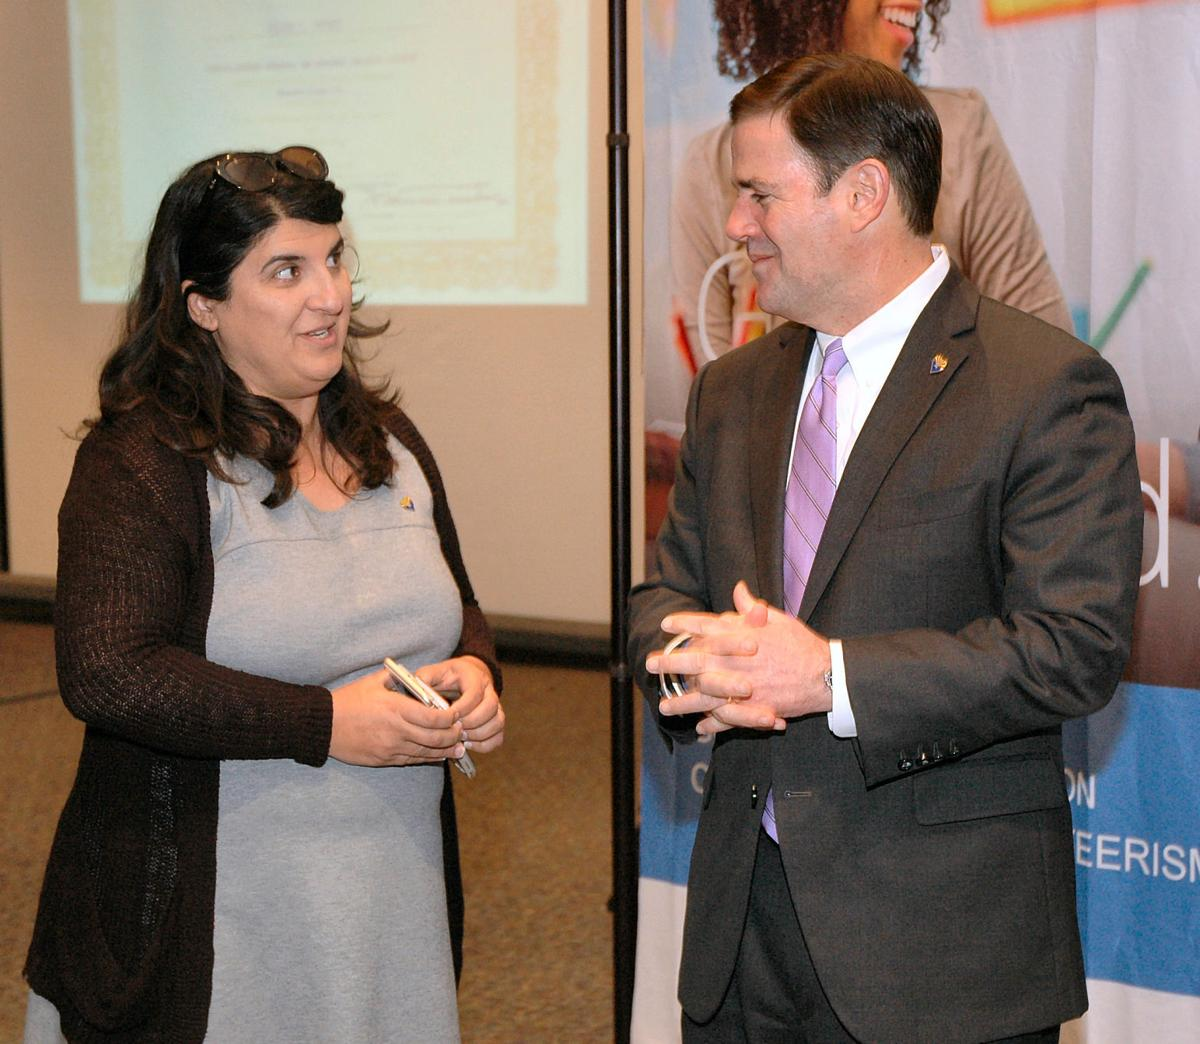 Gov. Doug Ducey and his education advisor